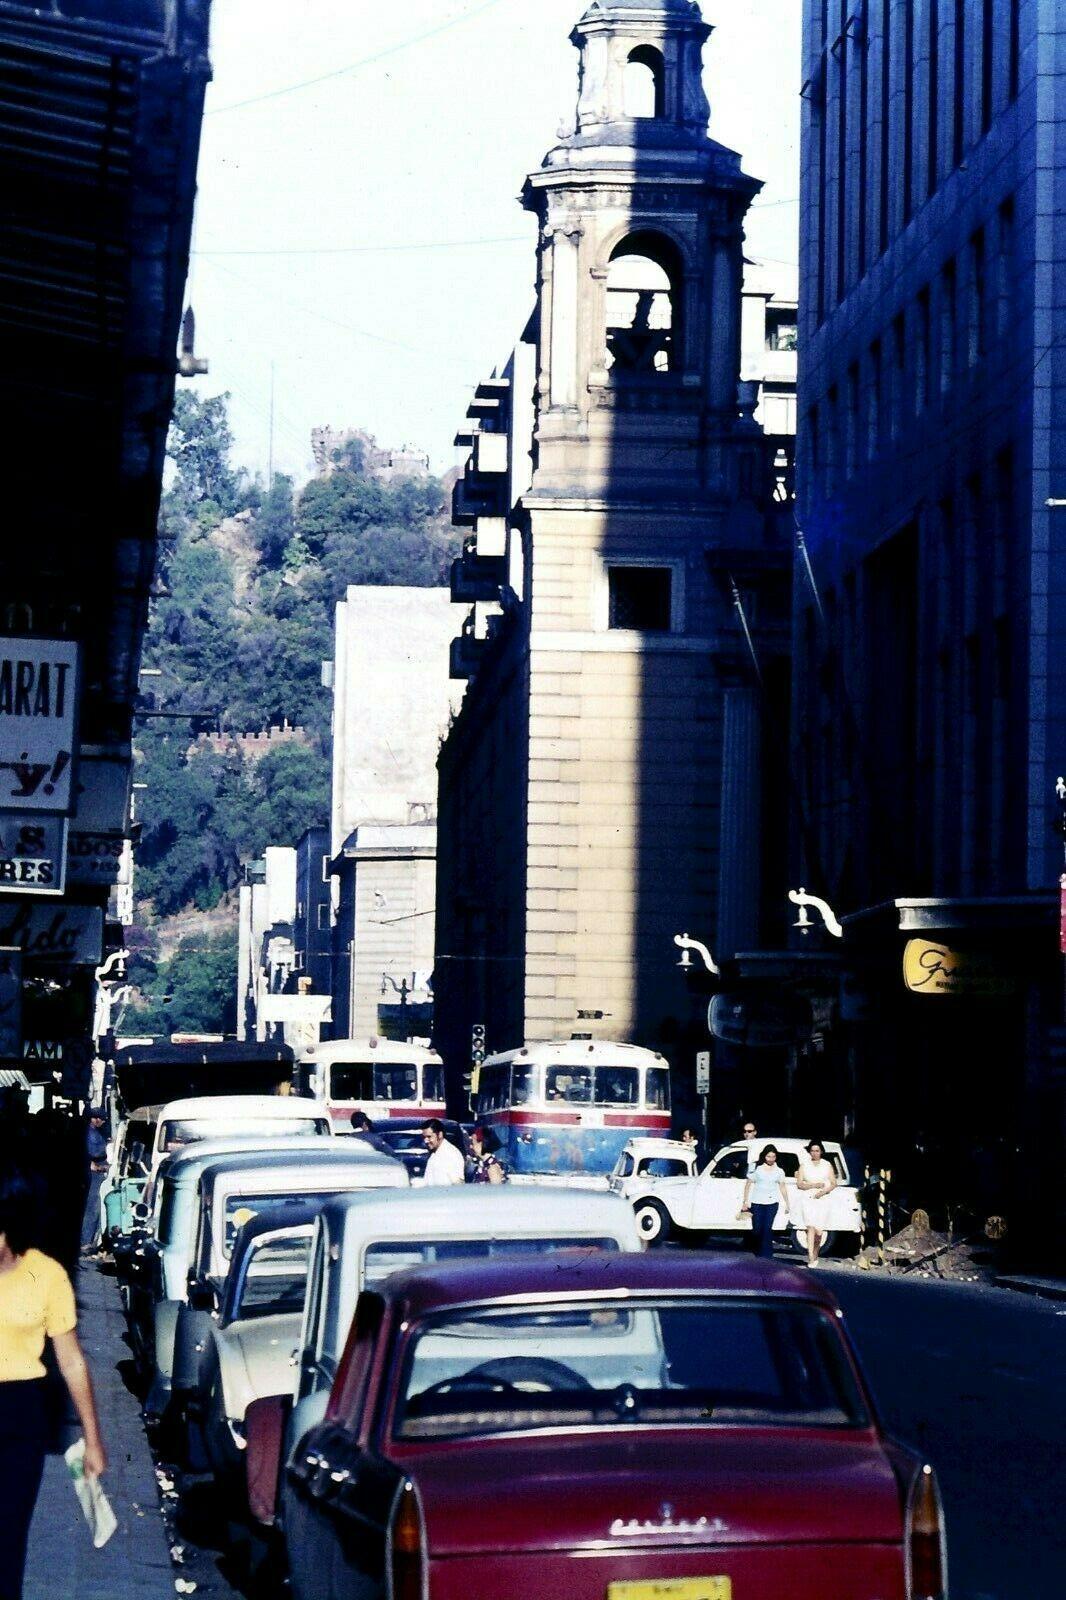 Enterreno - Fotos históricas de chile - fotos antiguas de Chile - Santiago: Iglesia de las Agustinas, 1965